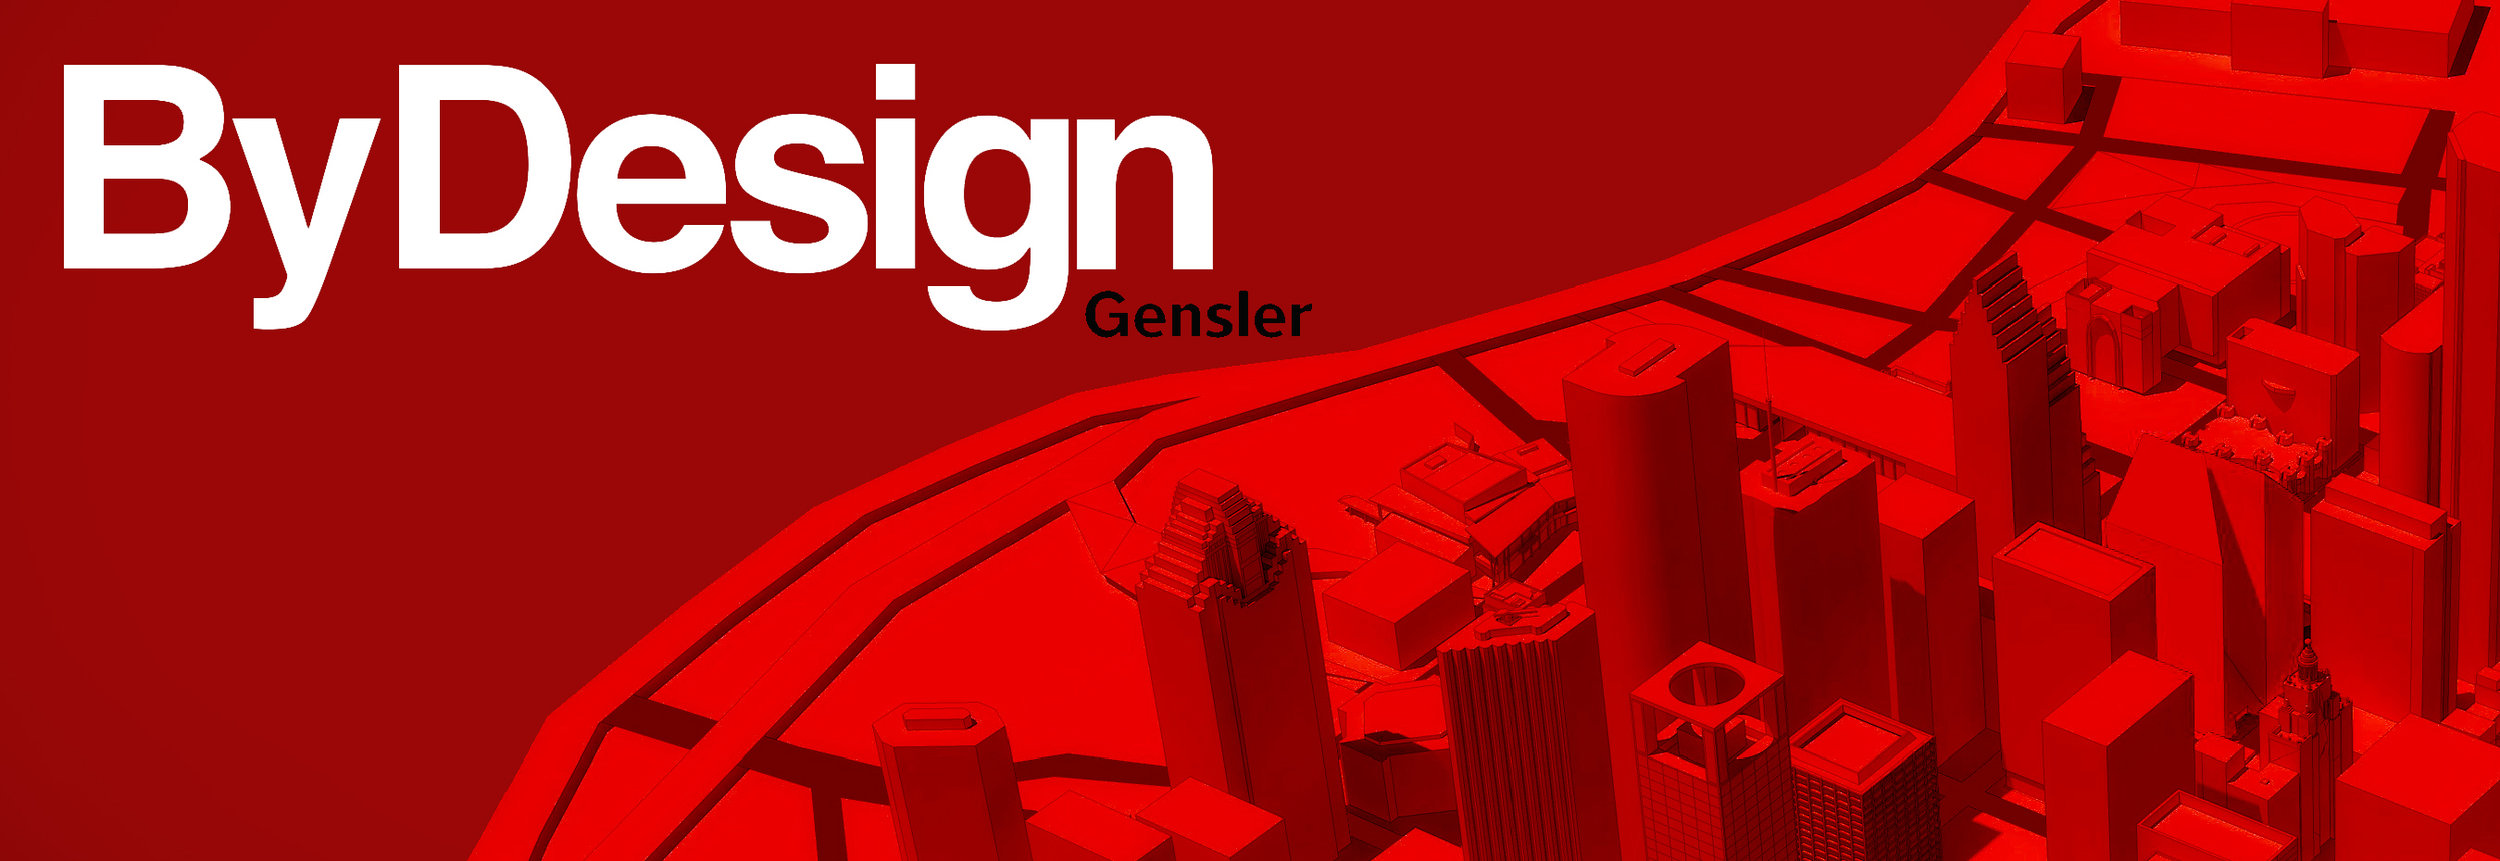 By-Design-Invite_copped.jpg